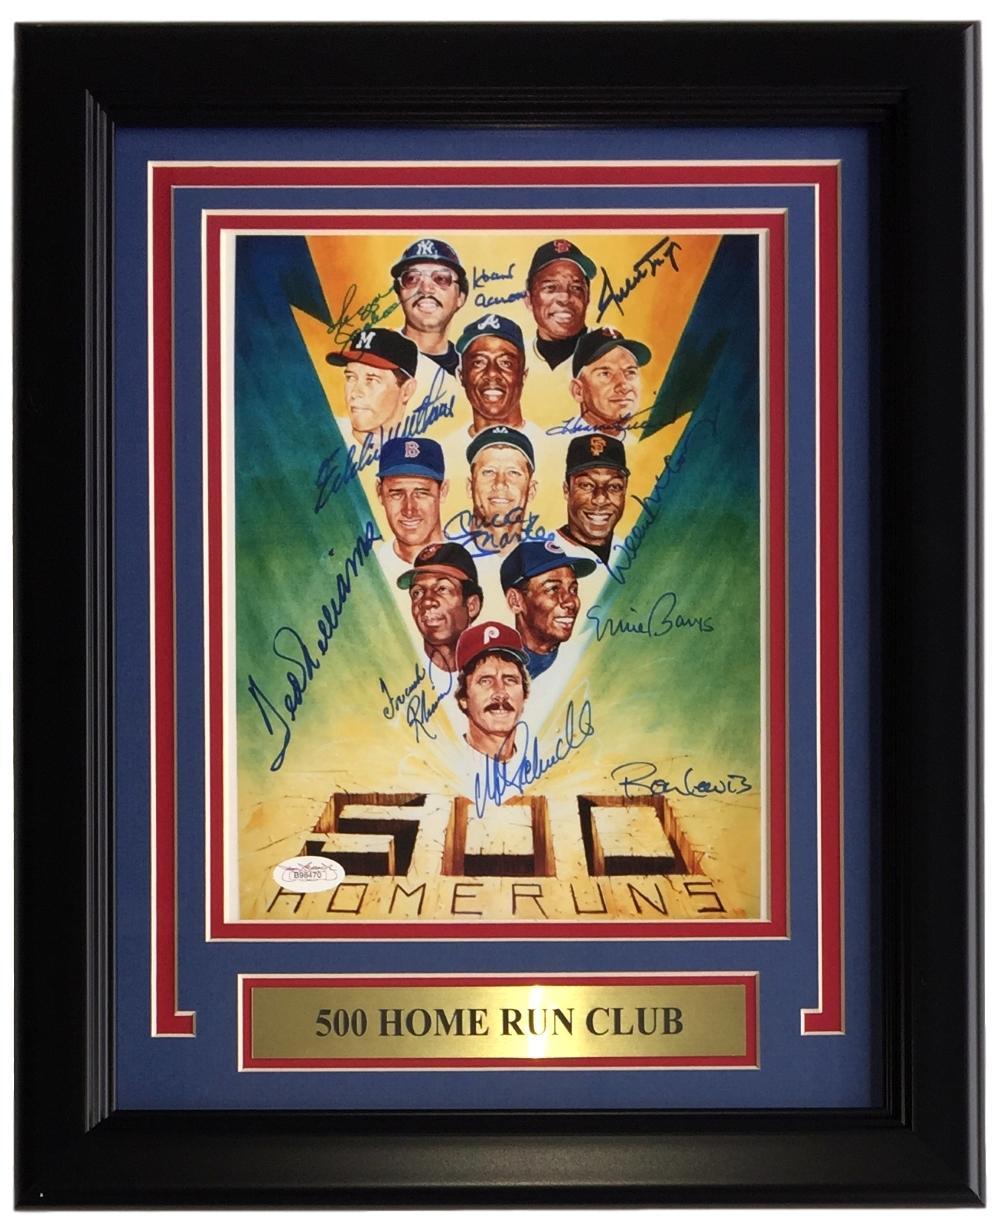 500 Home Run Club 11 Signed Framed 8x10 Photo JSA B98470 Mantle Mays ...